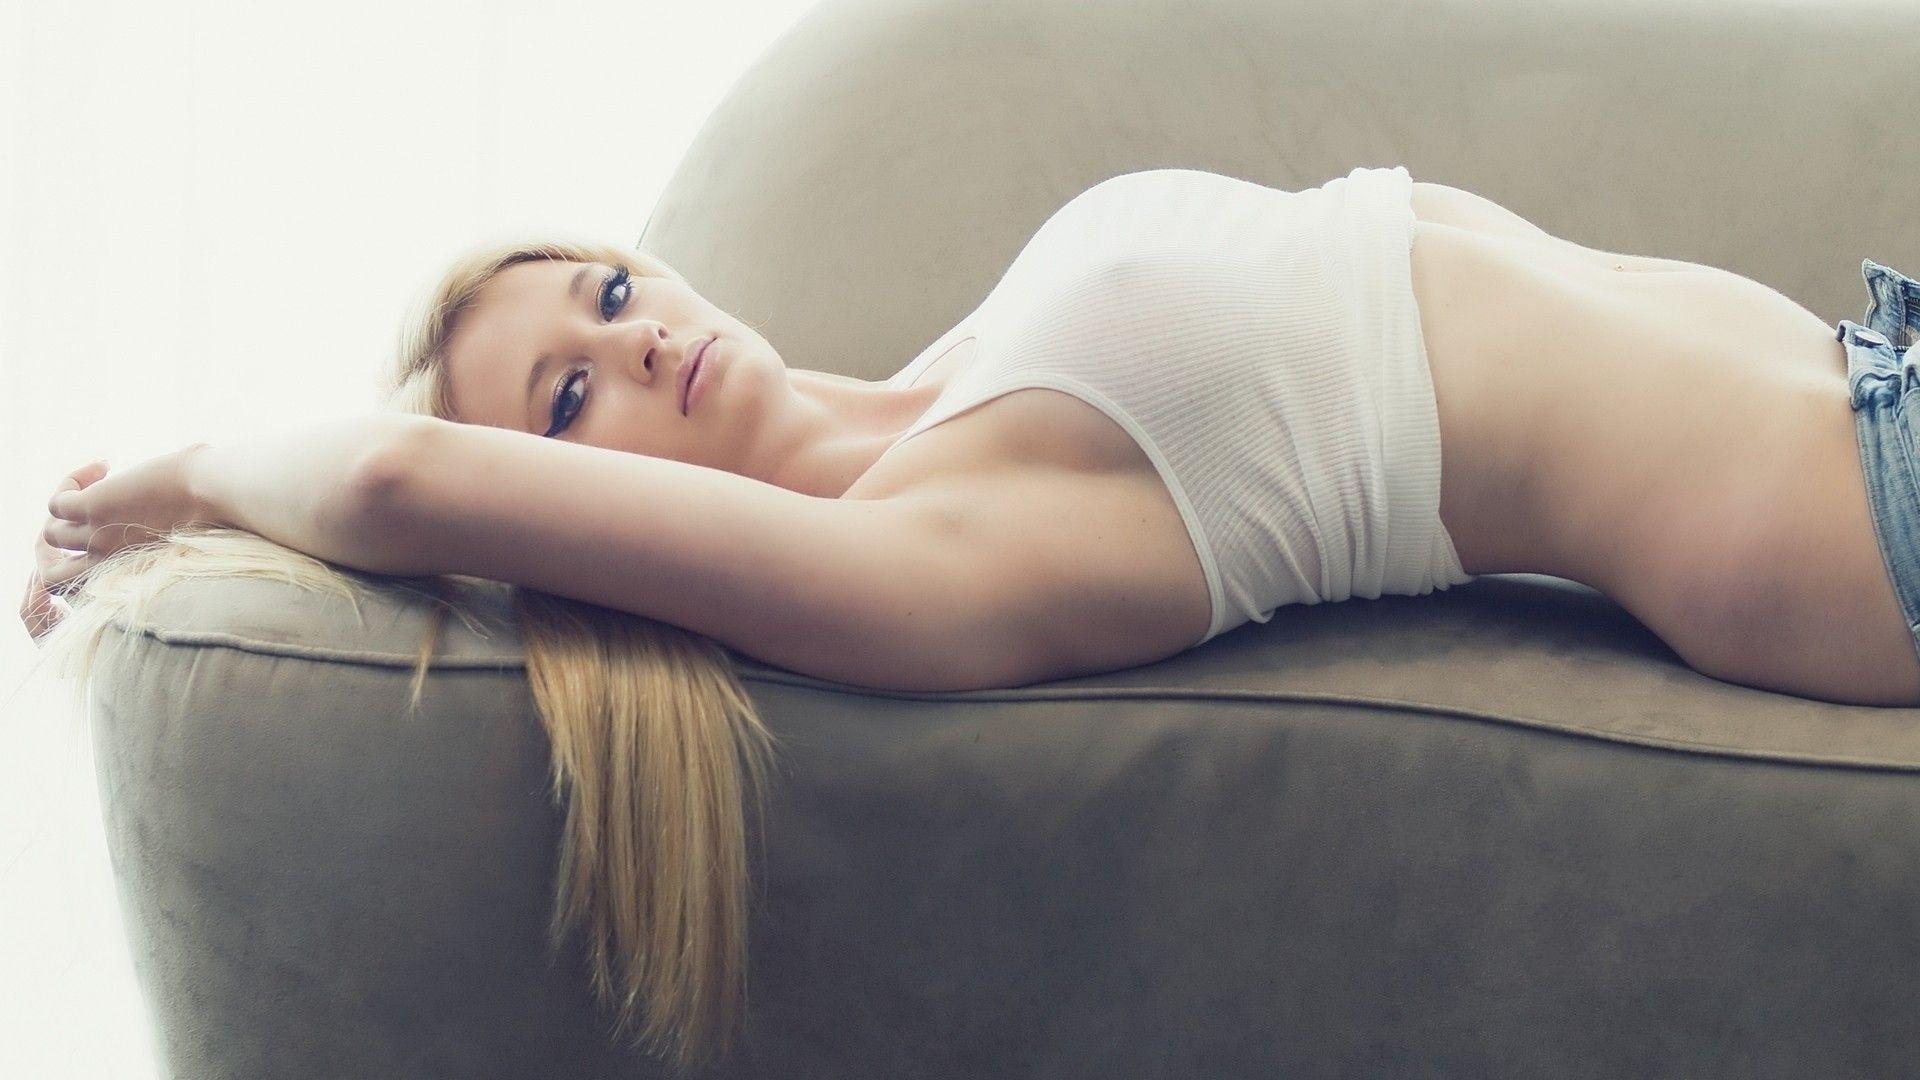 sexy sonali bendrenude fucking